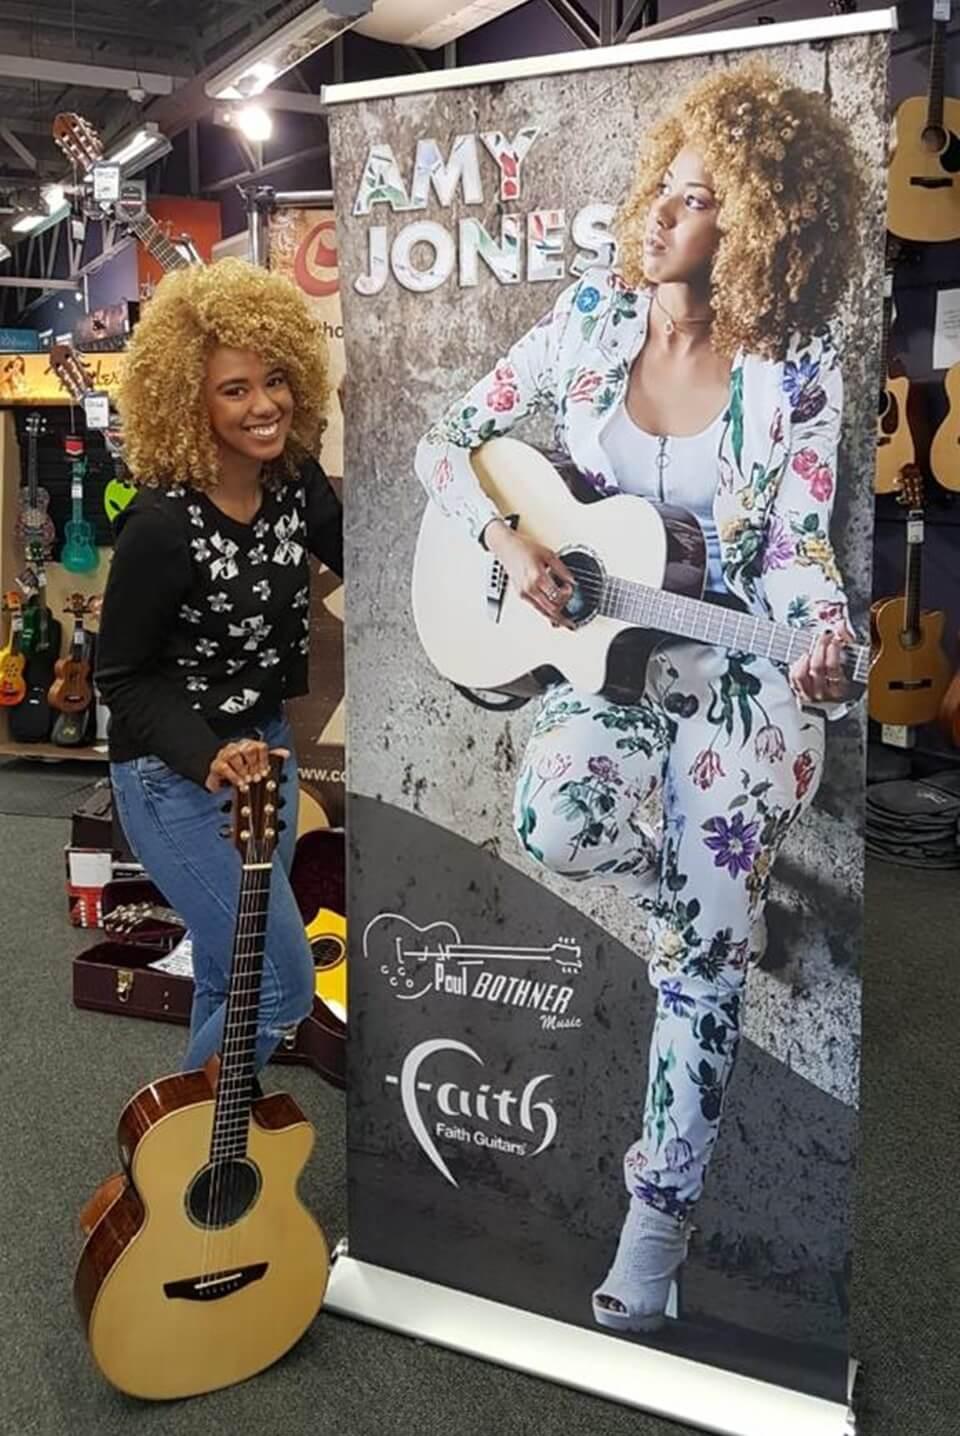 Amy Jones Musician | Muzoplanet | Faith Guitars